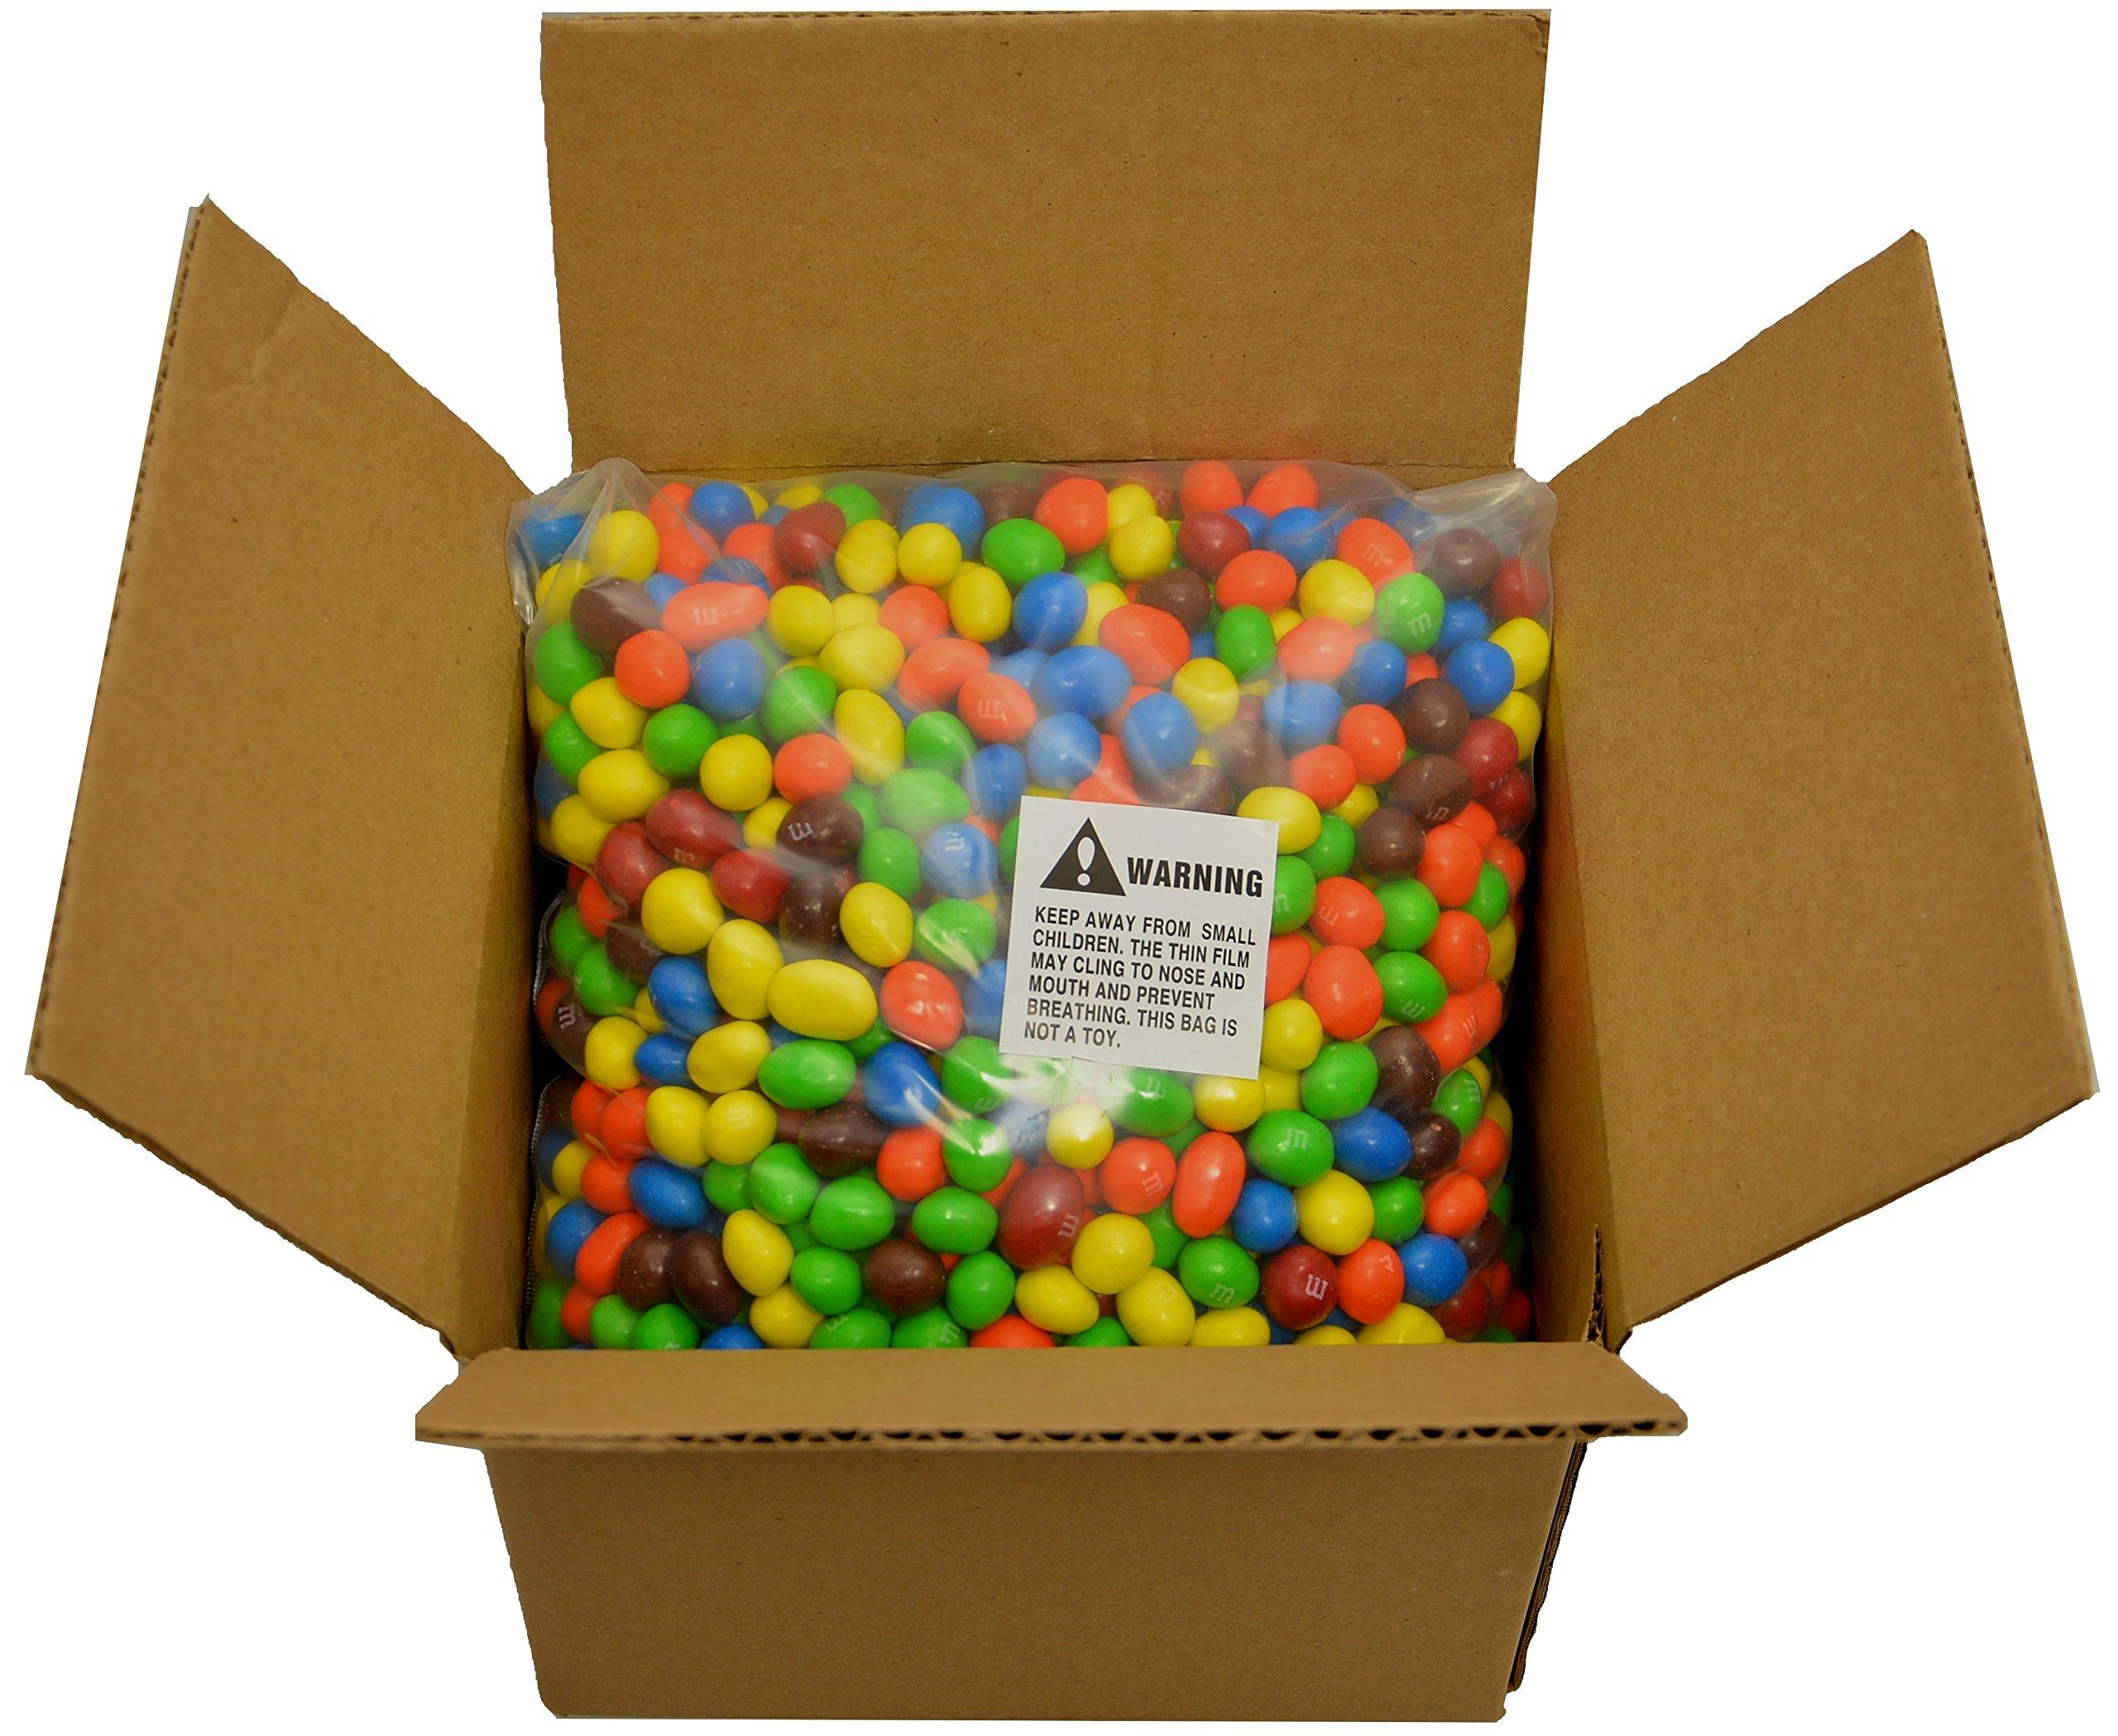 M&M's Peanut Bulk Wholesale - 10 Full Pounds by RiverFinn